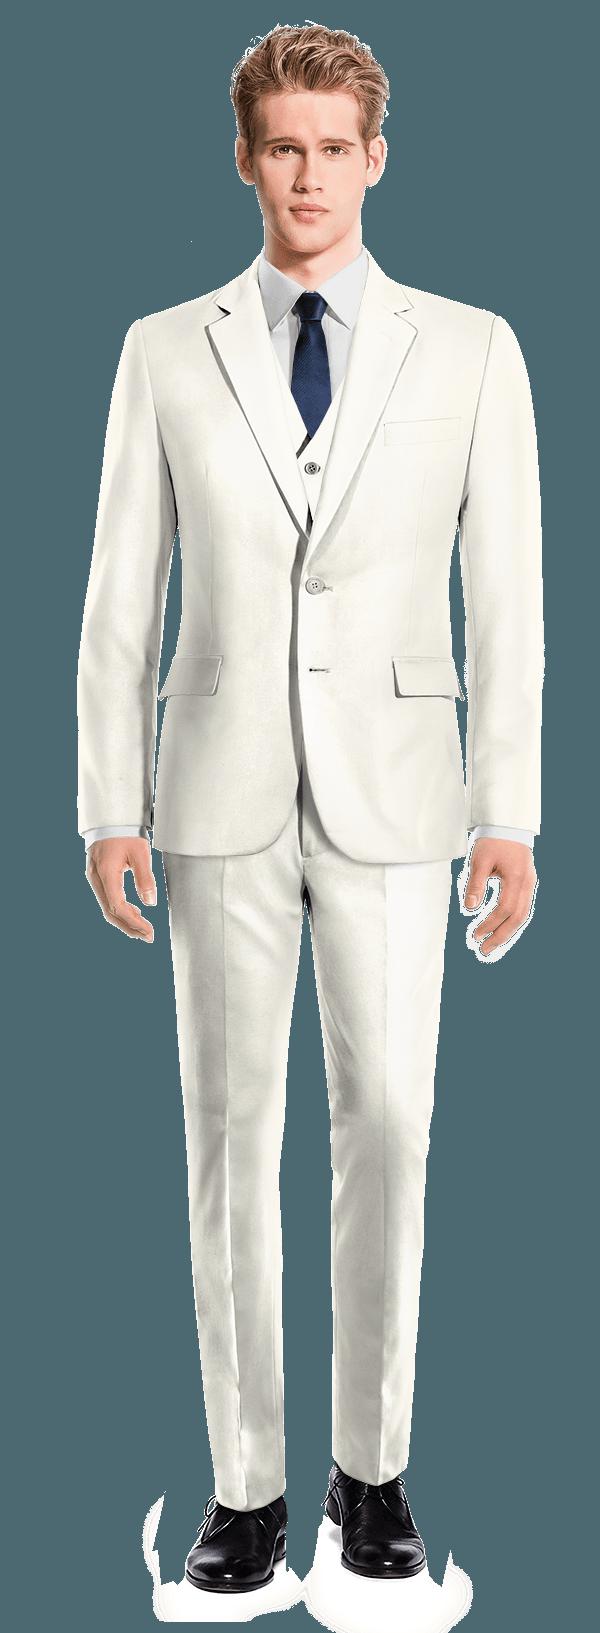 Costume blanc 3 pièces en Polyester